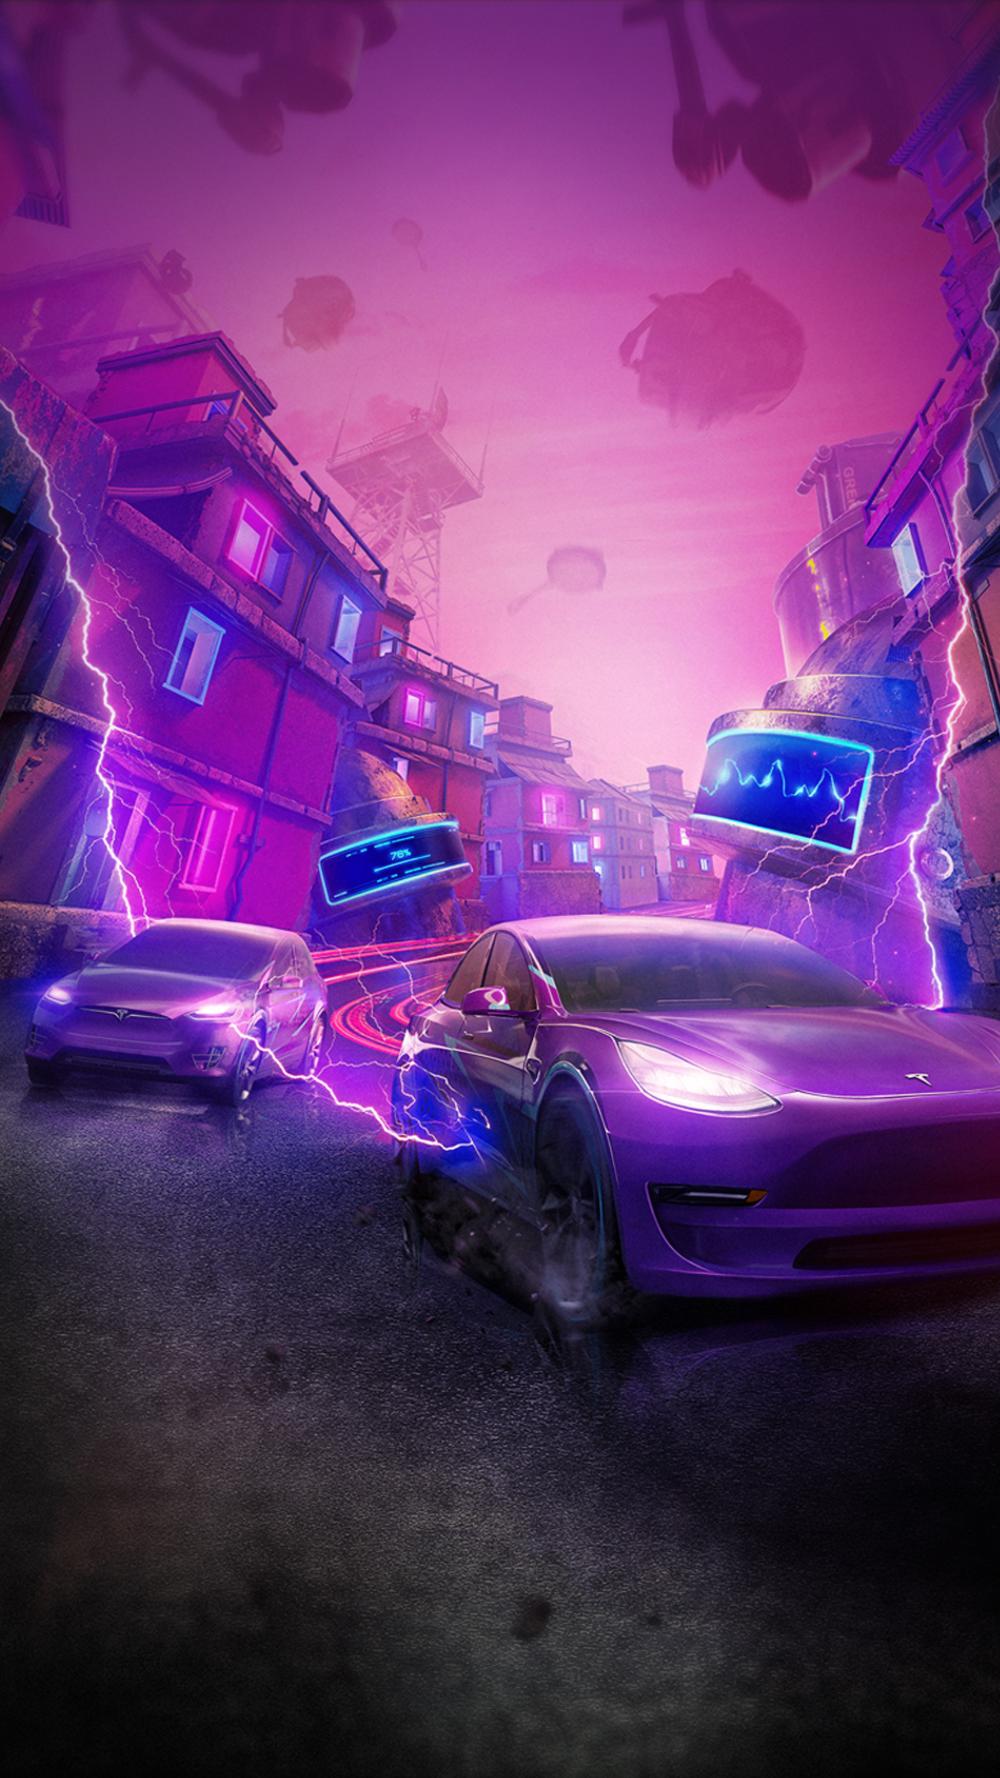 Tesla China On Twitter Tesla Model Tesla Neon Car